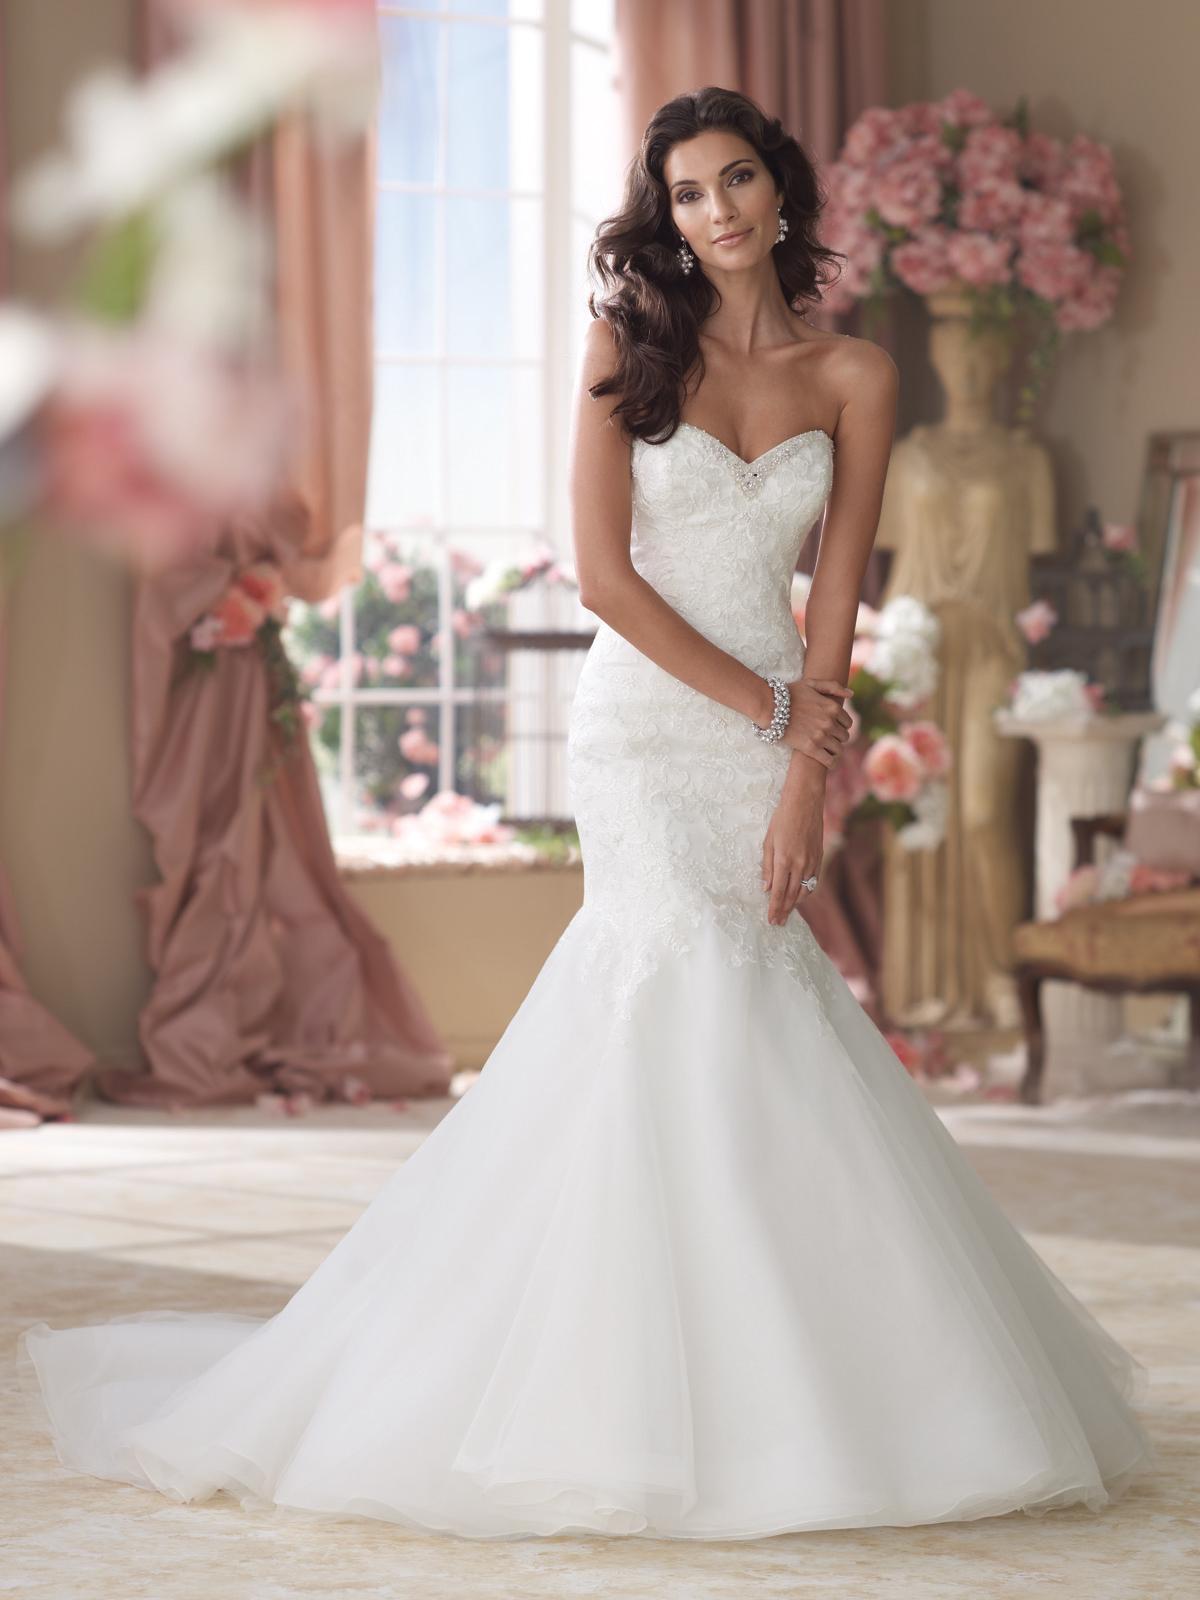 Vestido de Noiva Olympea - Hipnose Alta Costura e Spa para Noivas e Noivos - Campinas - SP Vestido de Noiva, Vestidos de Noiva Sereia, Hipnose Alta Costura, Vestido de Noiva Olympea